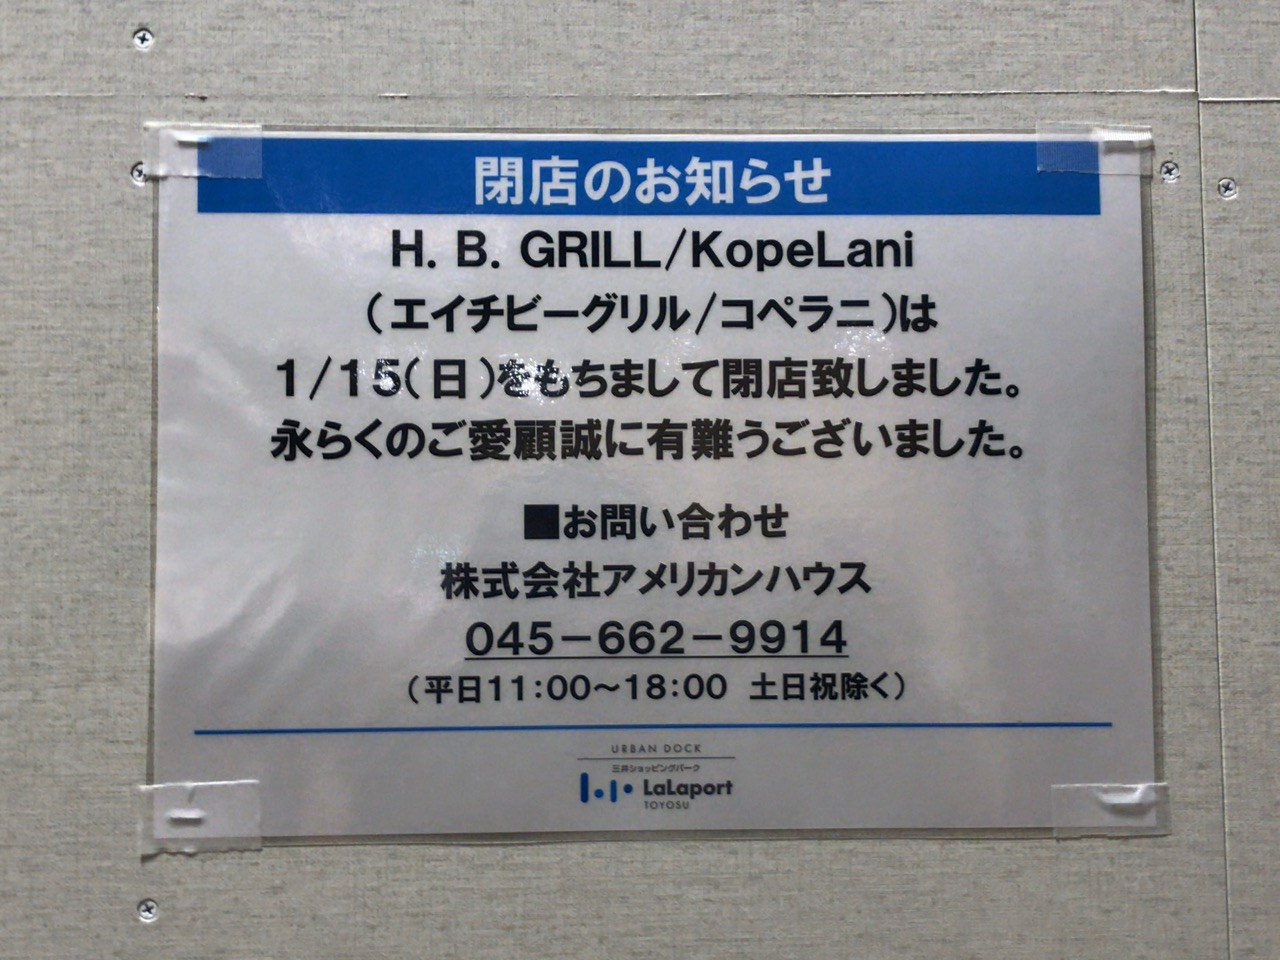 「H.B. GRILL」ららぽーと豊洲店が閉店し、アクアシティお台場店がオープン